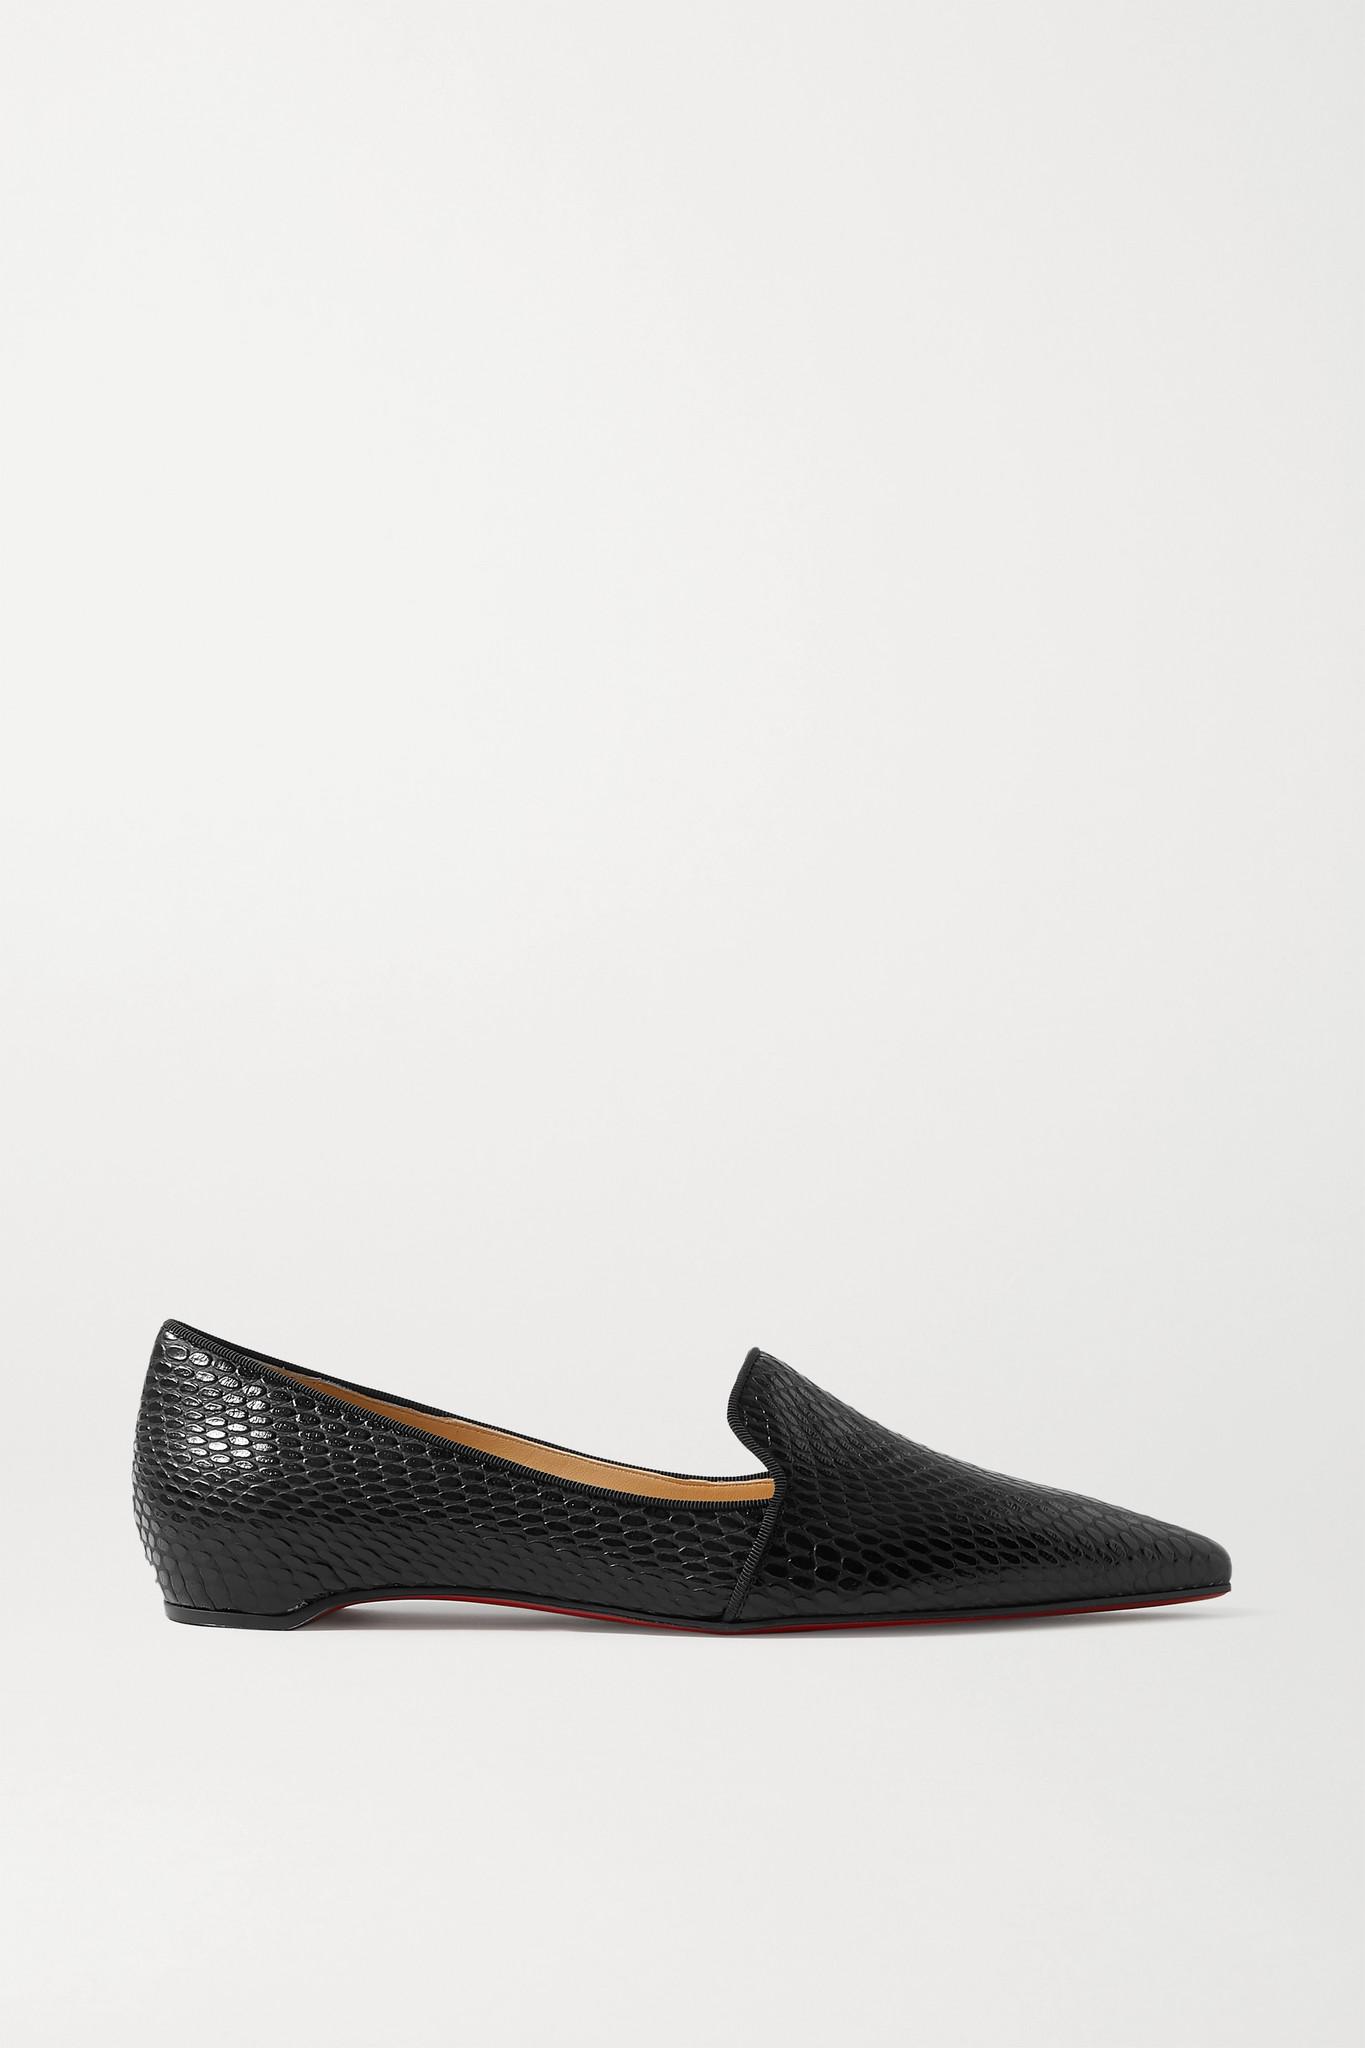 CHRISTIAN LOUBOUTIN - Kashasha Lizard-effect Leather Loafers - Black - IT35.5